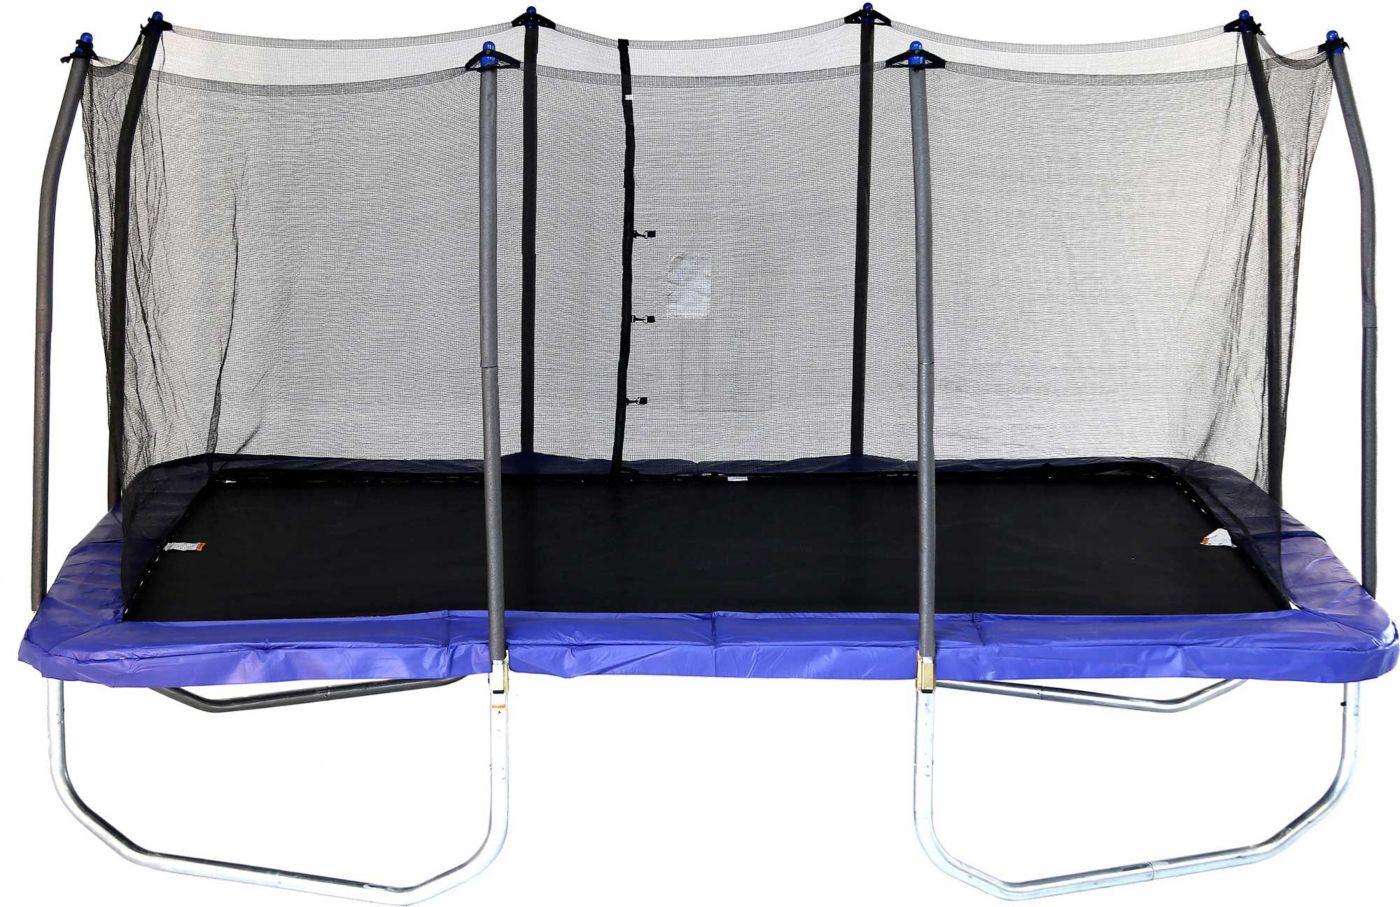 Skywalker Trampolines 15' Rectangle Trampoline with Enclosure